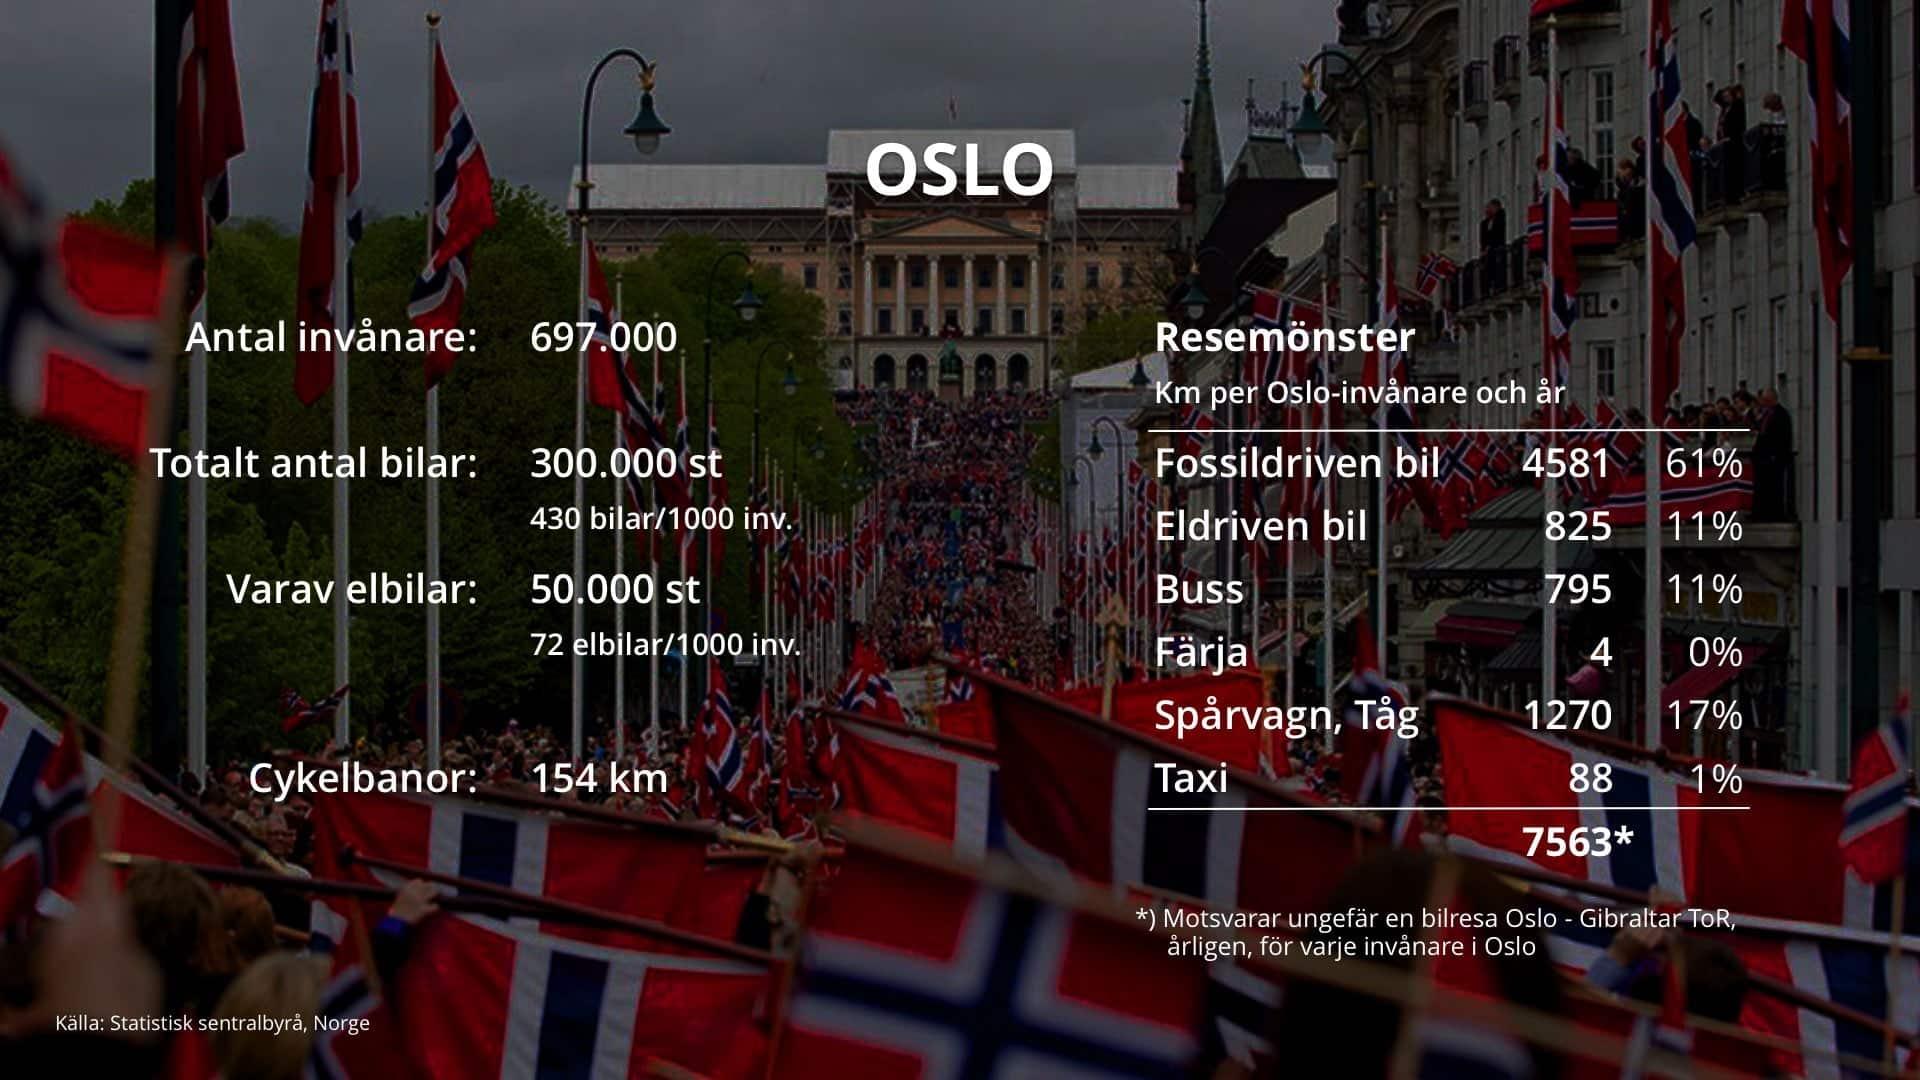 thefuture, Oslo-Resmönster